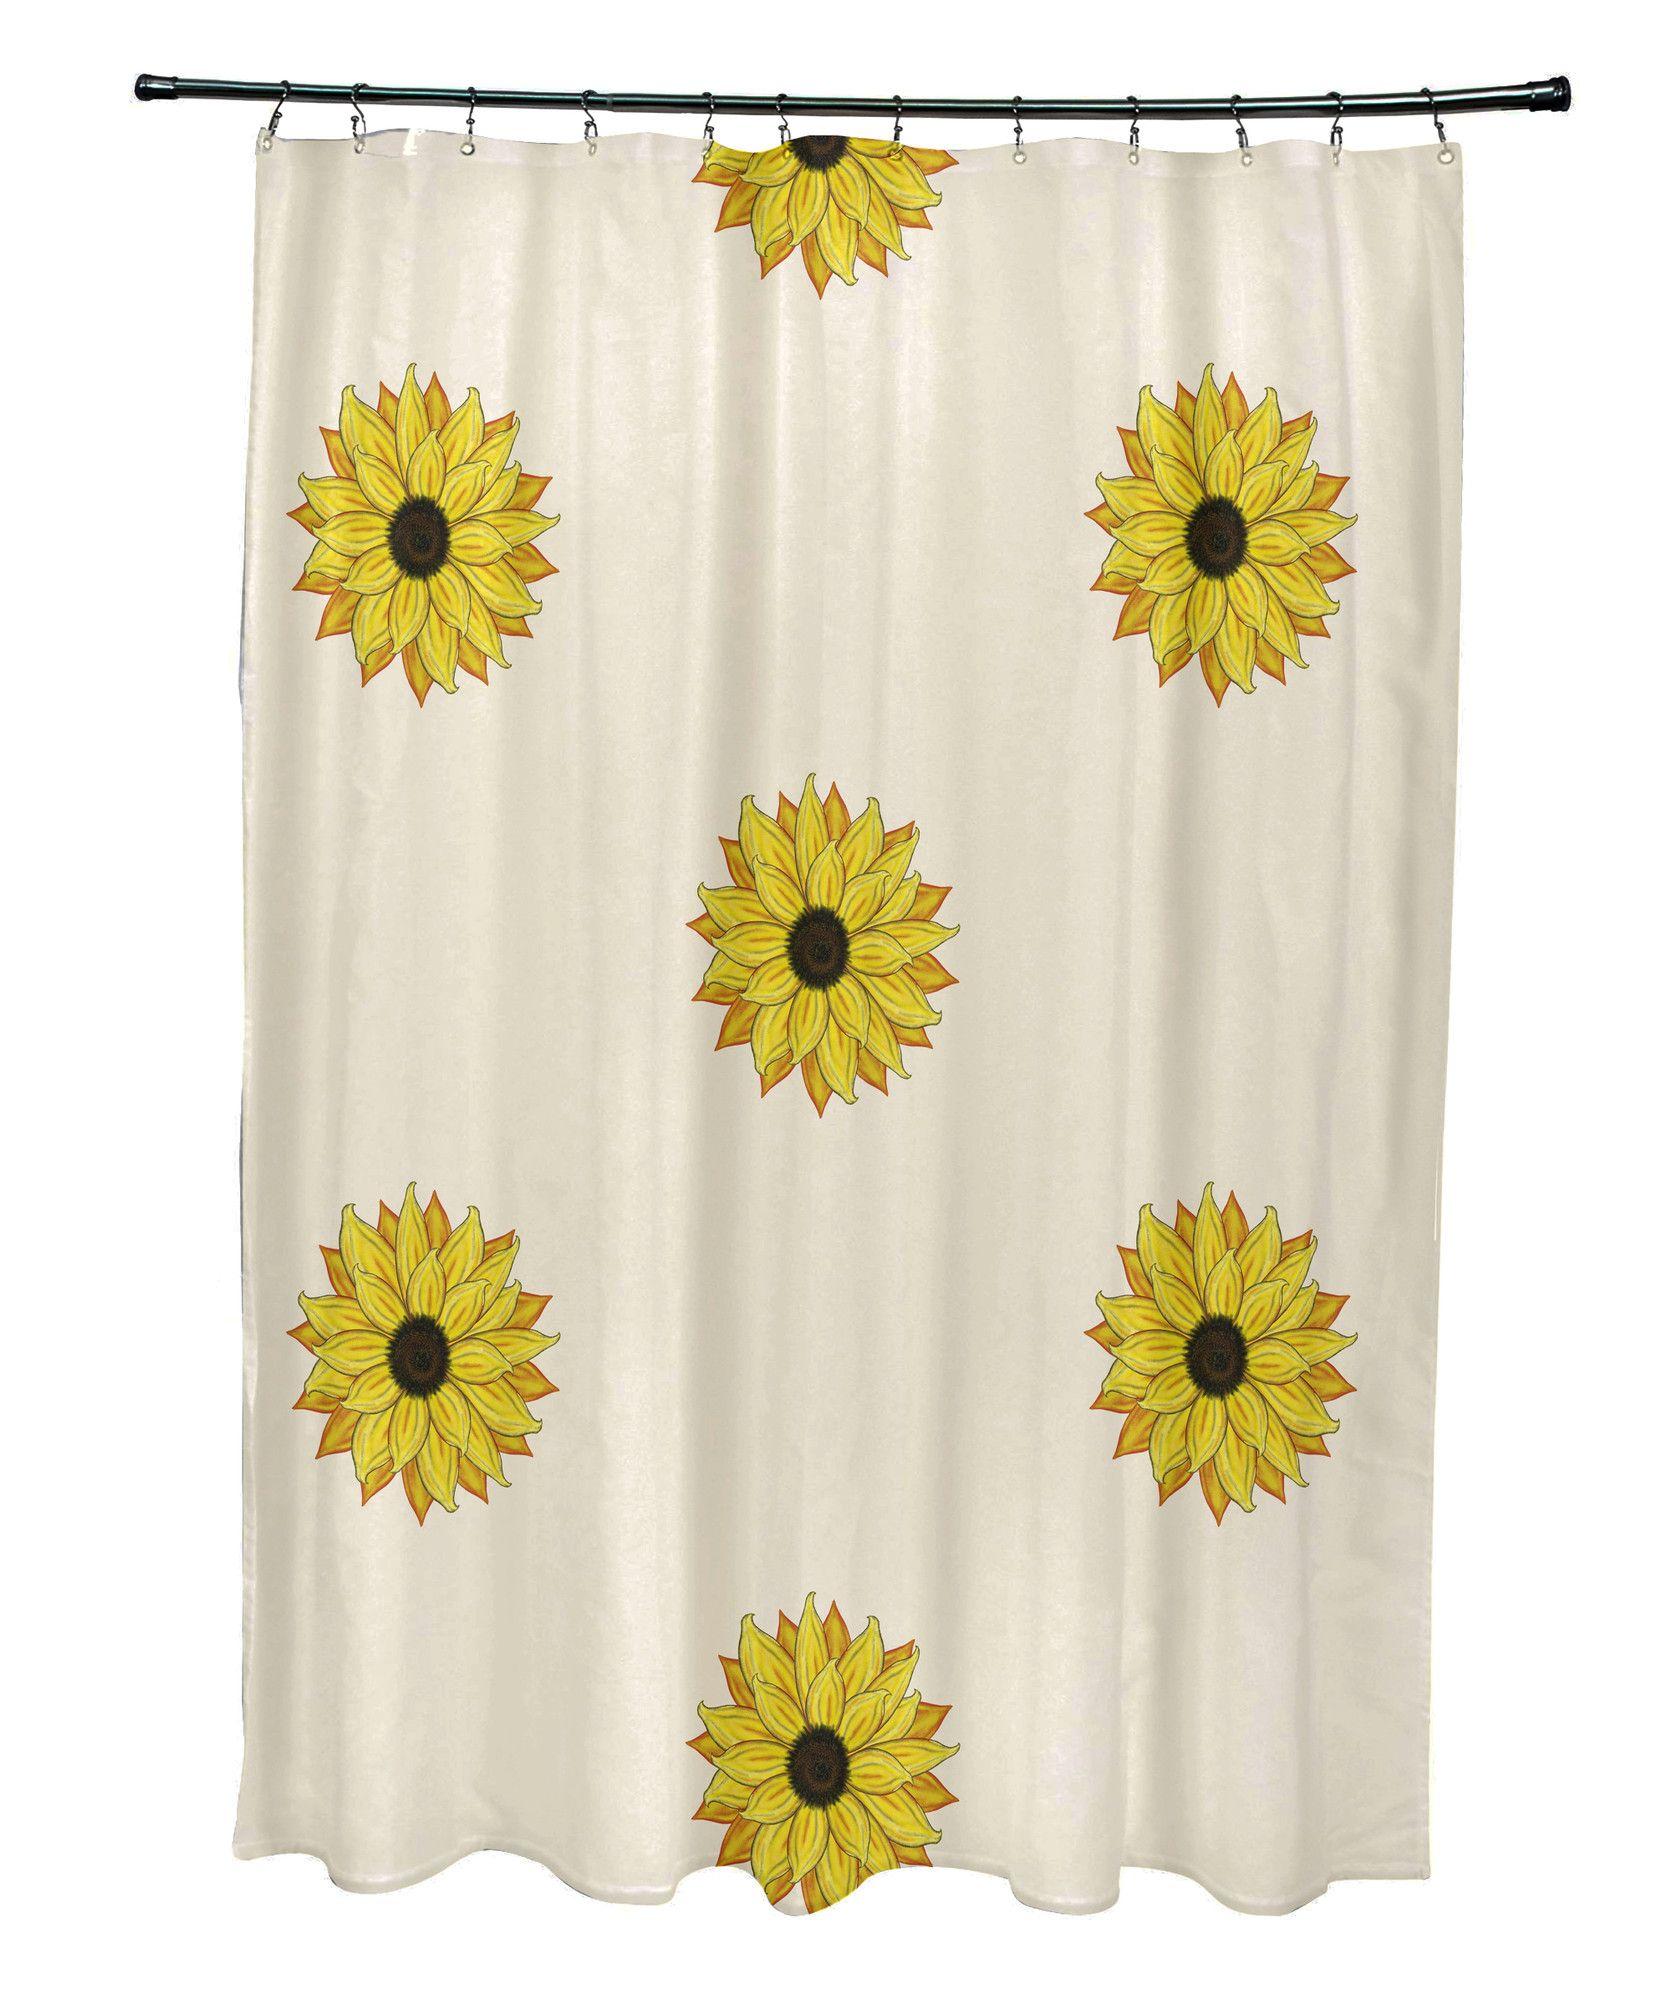 Vieux Sunflower Frenzy Flower Print Single Shower Curtain Shower